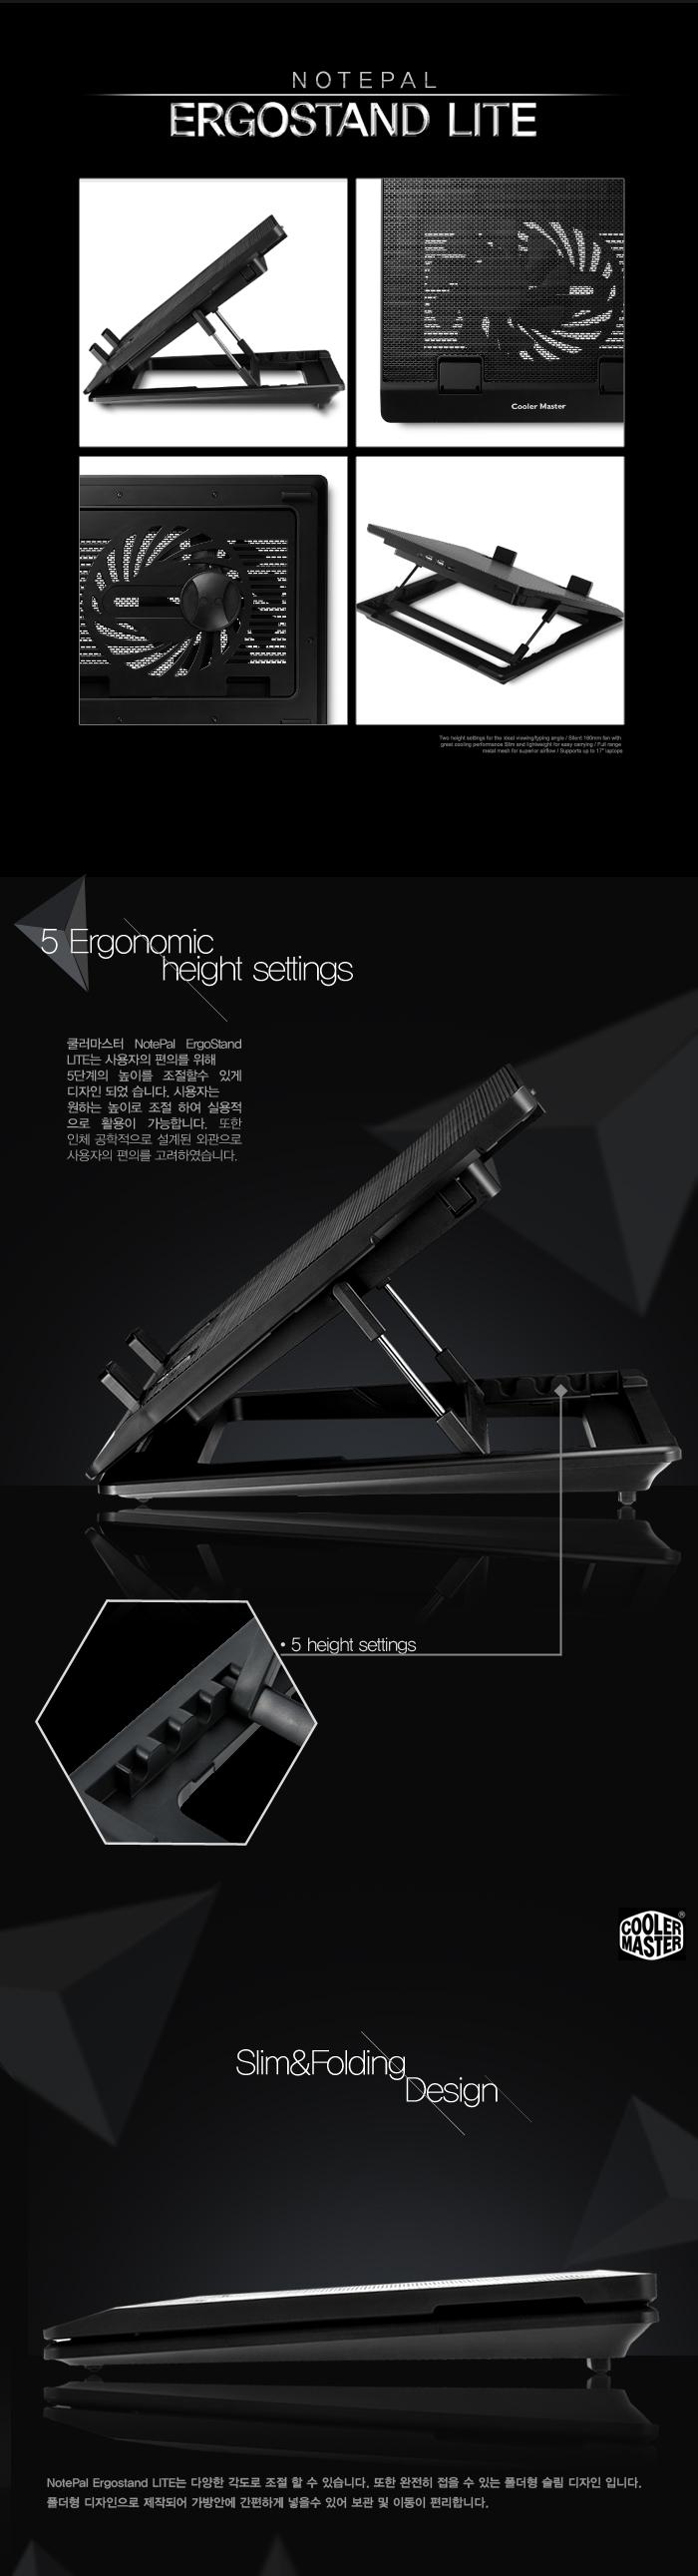 5 Ergonomic height settings 쿨러마스터 NotePal ErgoStand LITE는 사용자의 편의를 위해 5단계의 높이를 조절할 수 있게 디자인 되었습니다. 사용자는 원하는 높이로 조절하여 실용적으로 활용이 가능합니다. 또한 인체 공학적으로 설계된 외관으로 사용자의 편의를 고려하였습니다. - 5 height settings Slim&Folding Design NotePal Ergostand LITE는 다양한 각도로 조절 할 수 있습니다. 또한 완전히 접을 수 있는 폴더형 슬림 디자인 입니다. 폴더형 디자인으로 제작되어 가방 안에 간편하게 넣을 수 있어 보관 및 이동이 편리합니다.